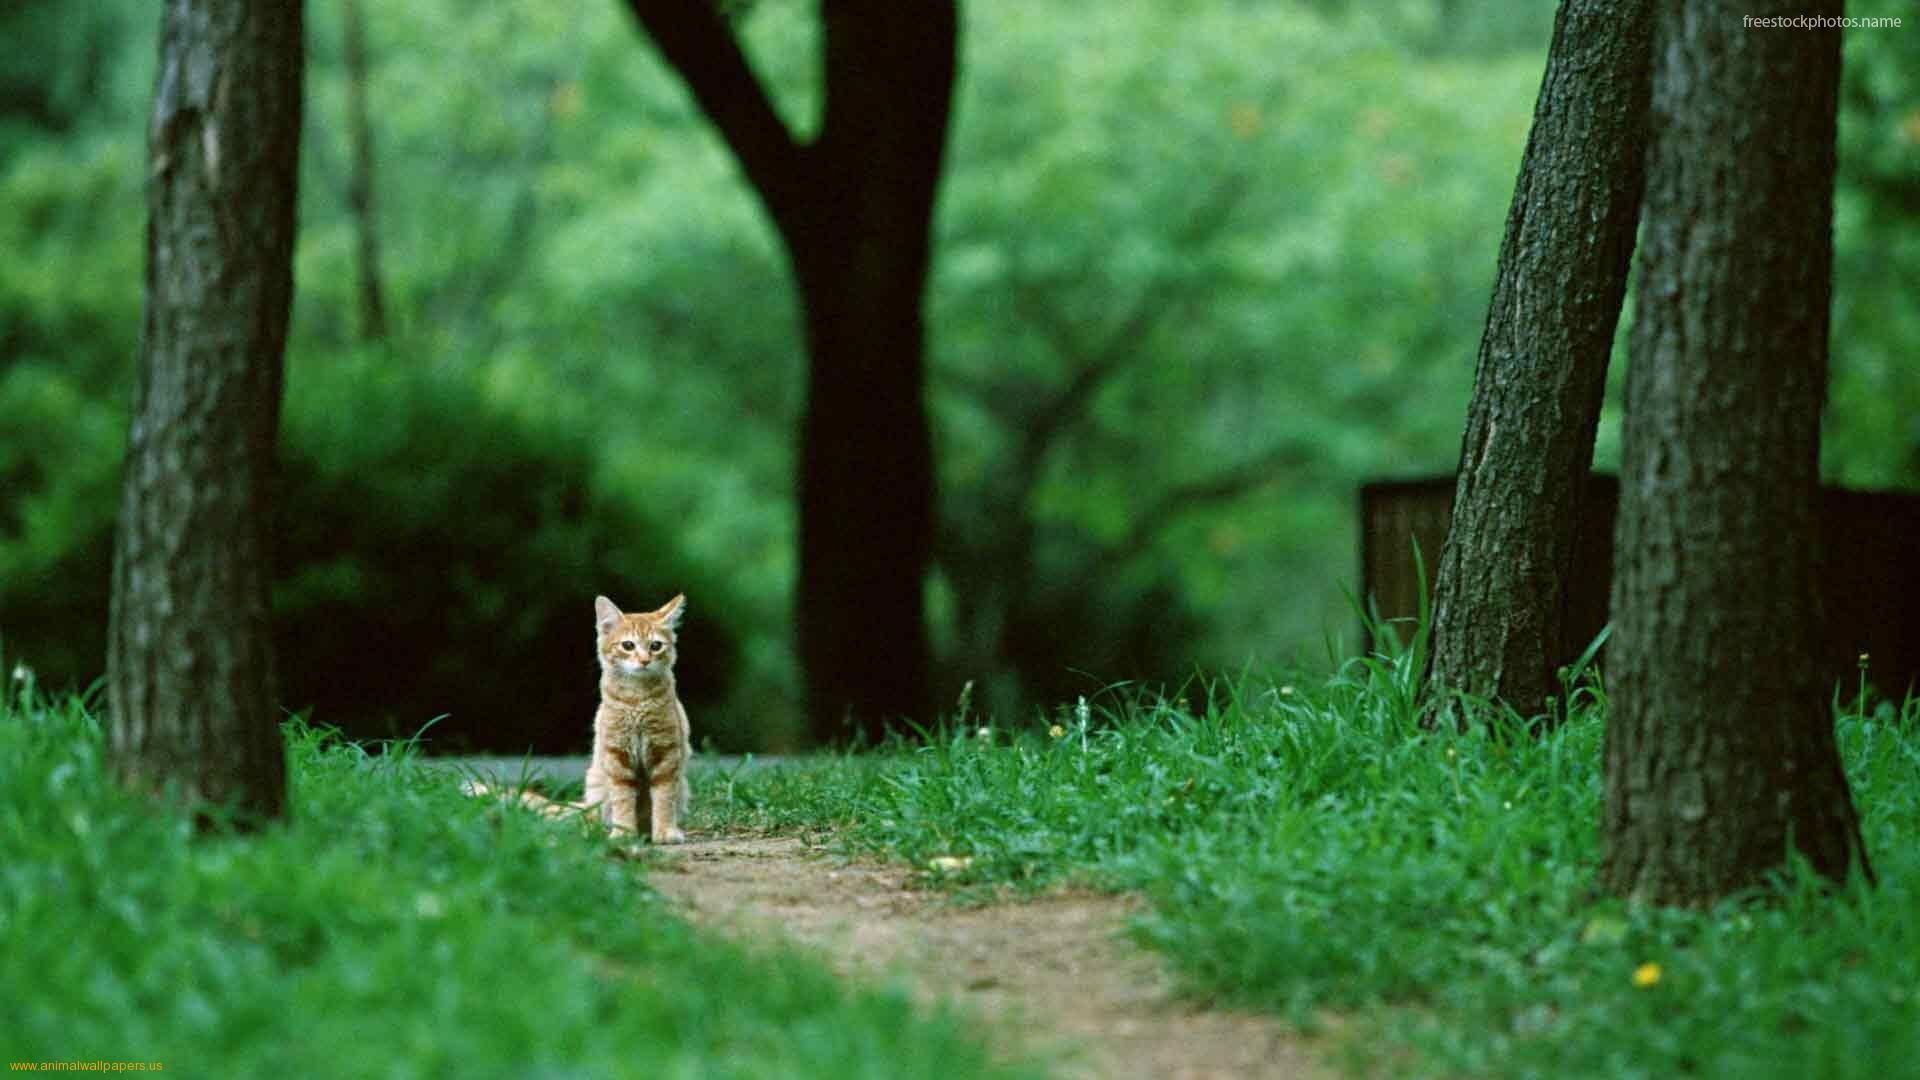 Woods Background Hd Desktop Wallpapers K Hd 2304 1296 Woods